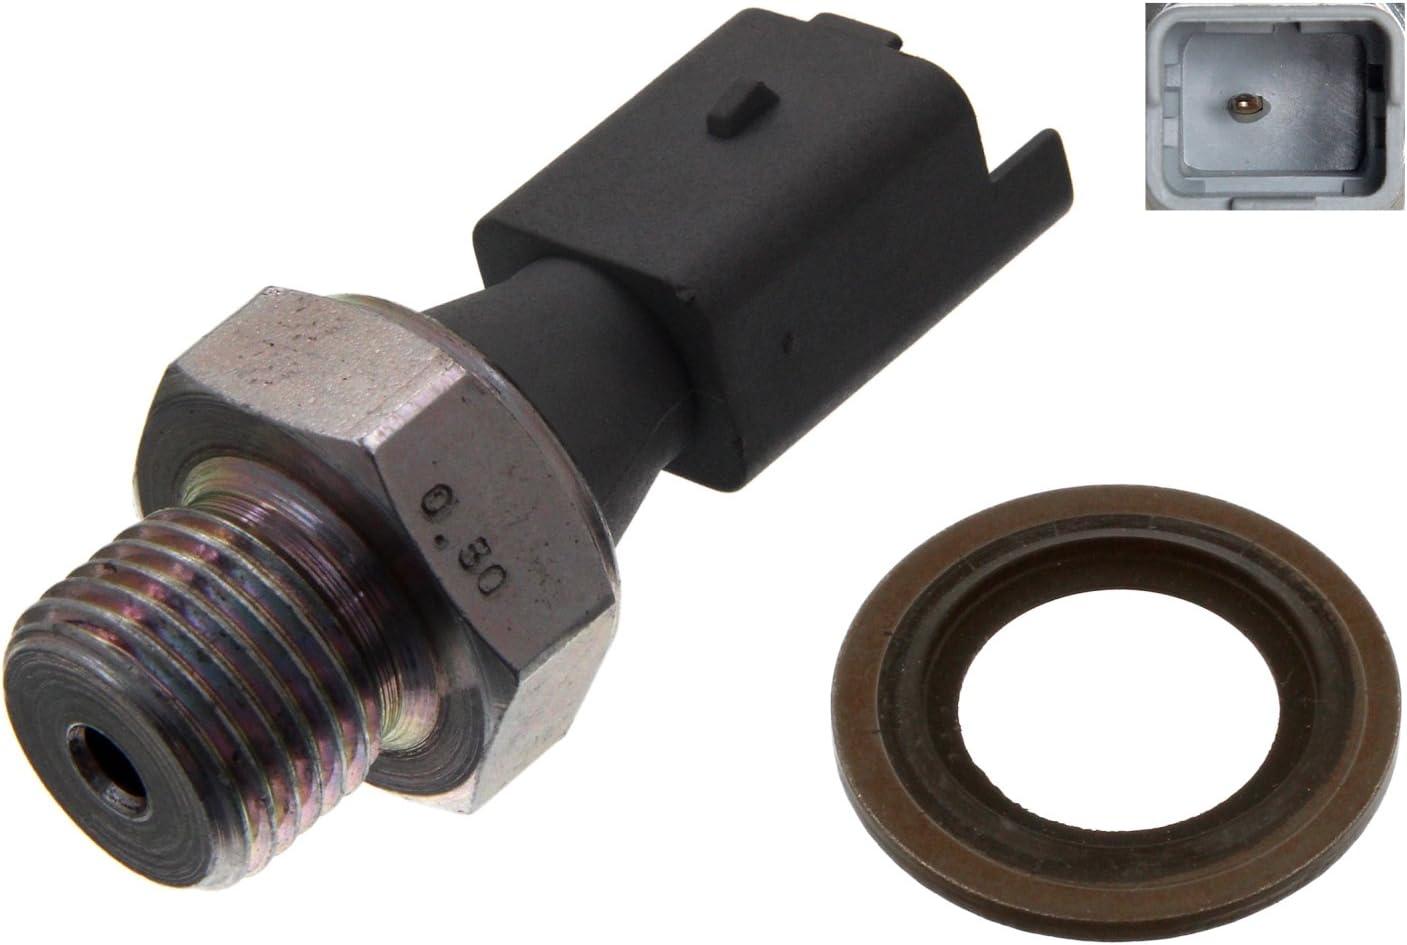 Brand New 1 Year Warranty! Peugeot RCZ Oil Pressure Switch